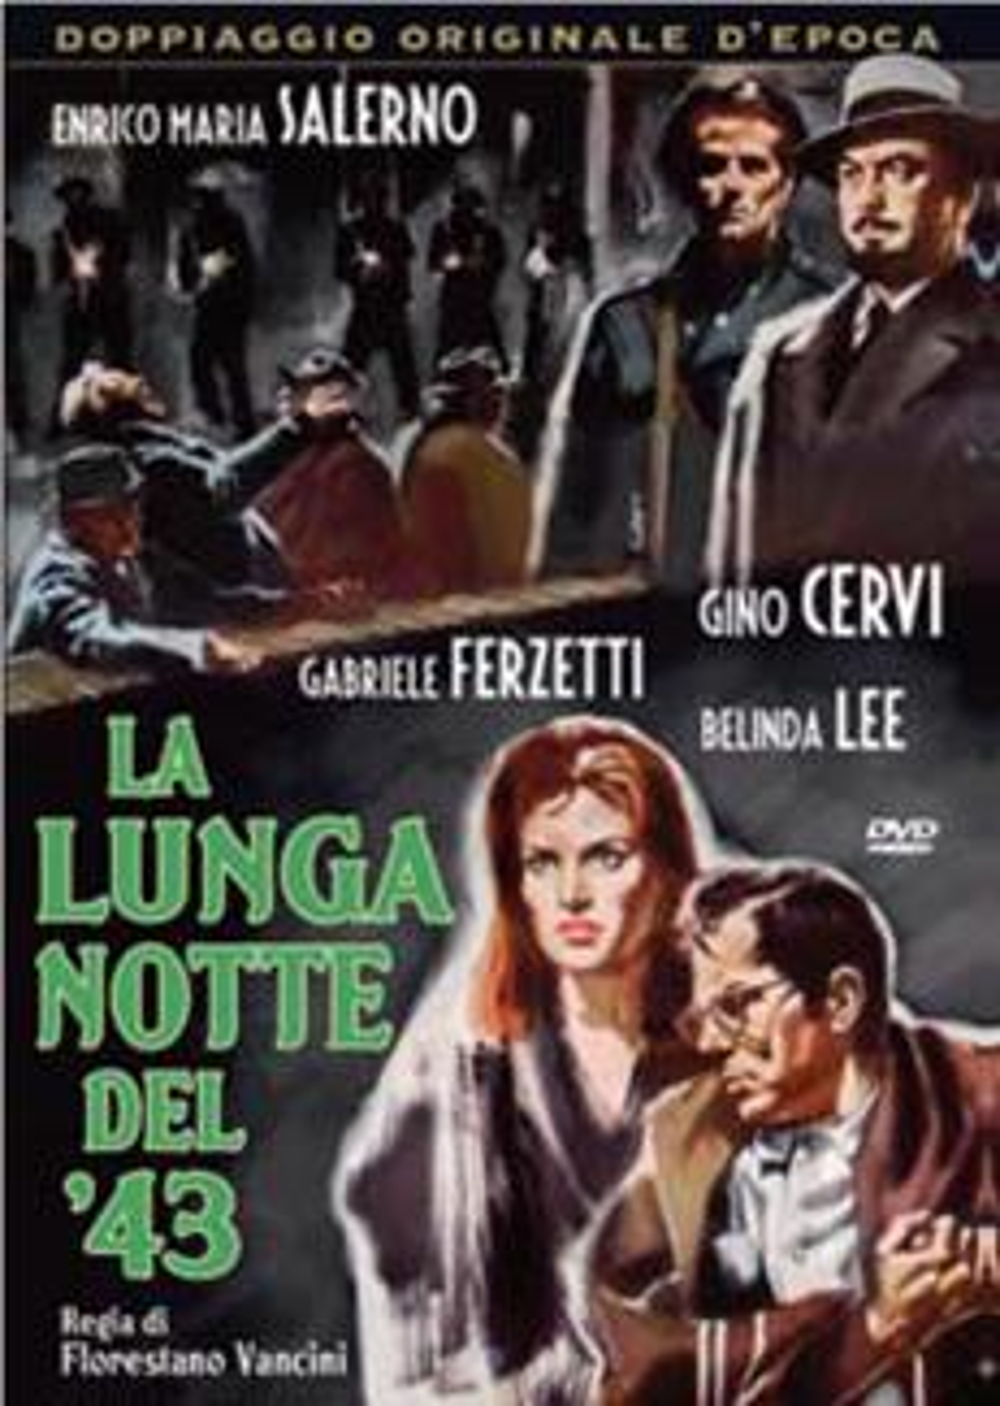 LA LUNGA NOTTE DEL 43 (DVD)